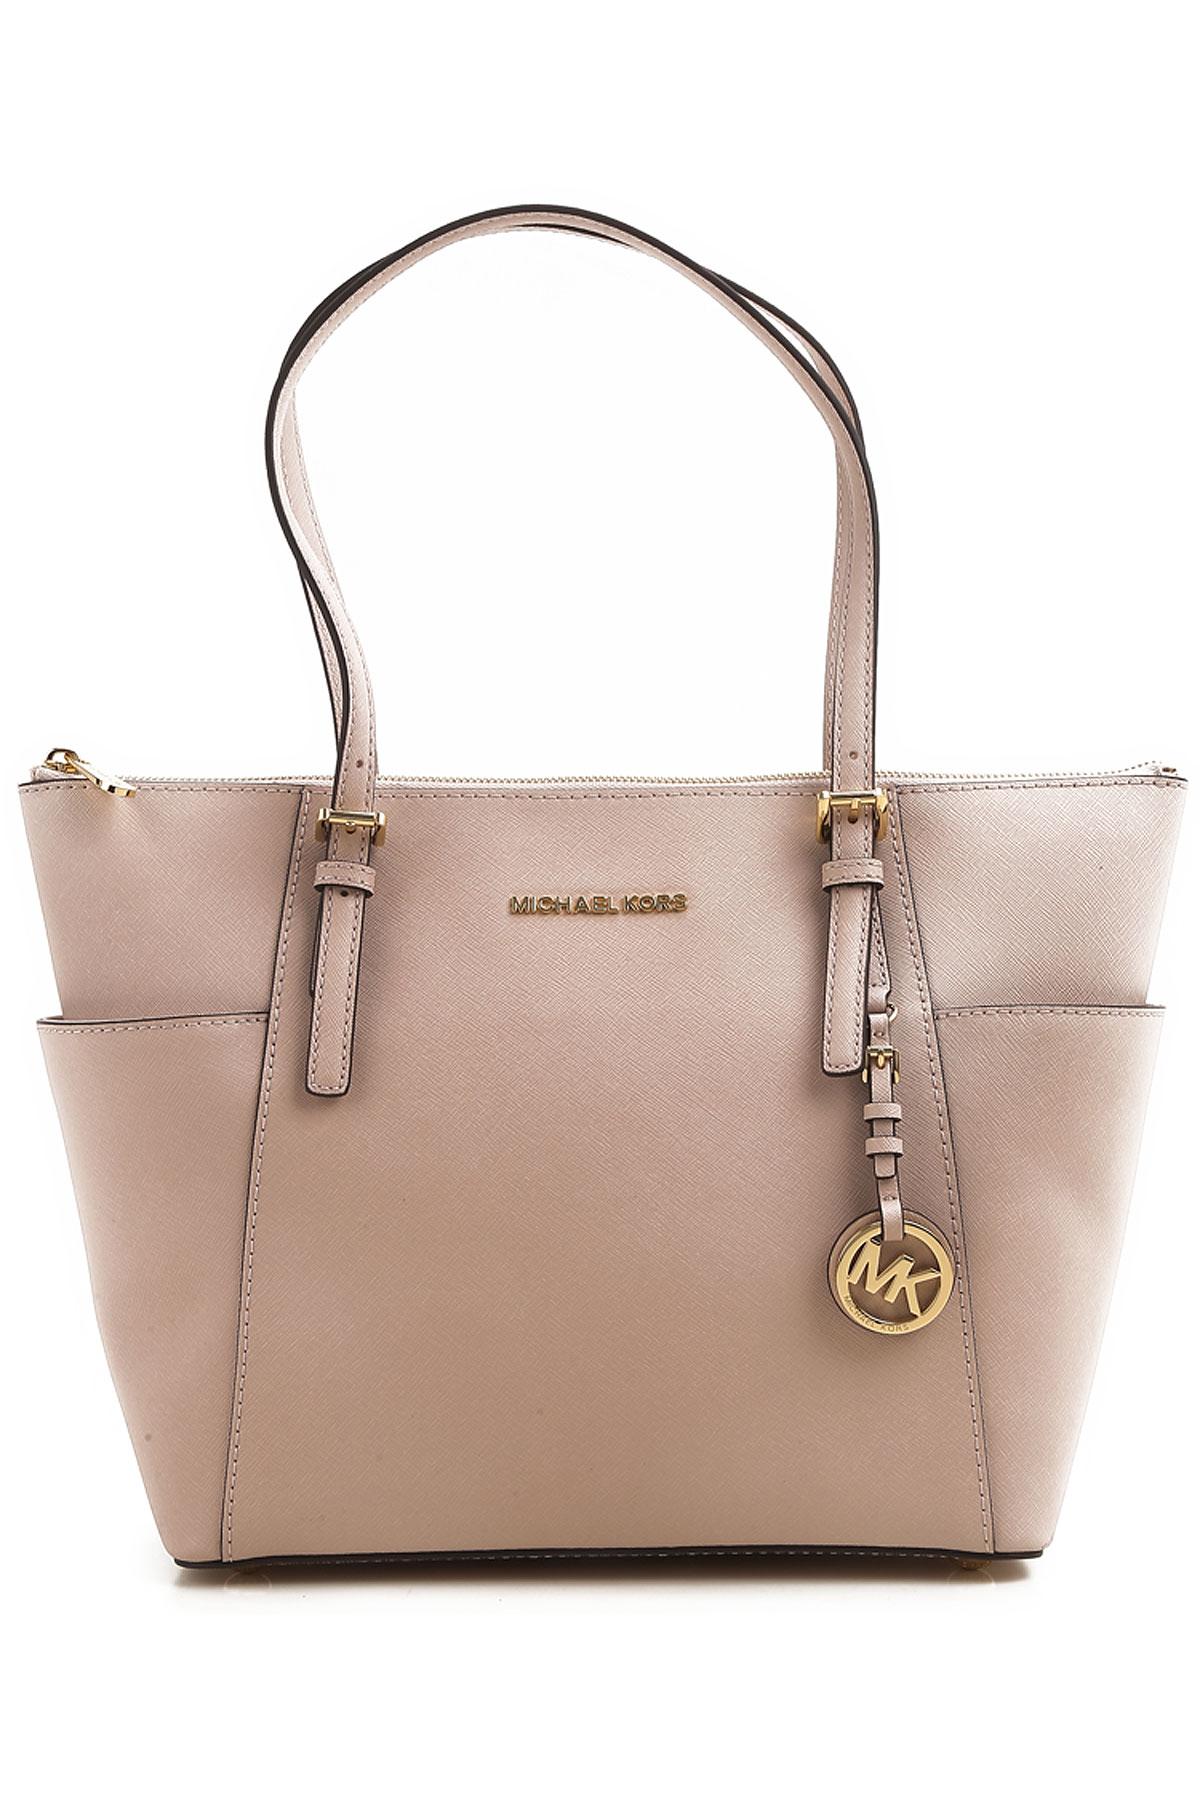 Michael Kors Tote Bag On Sale, soft pink, Leather, 2017